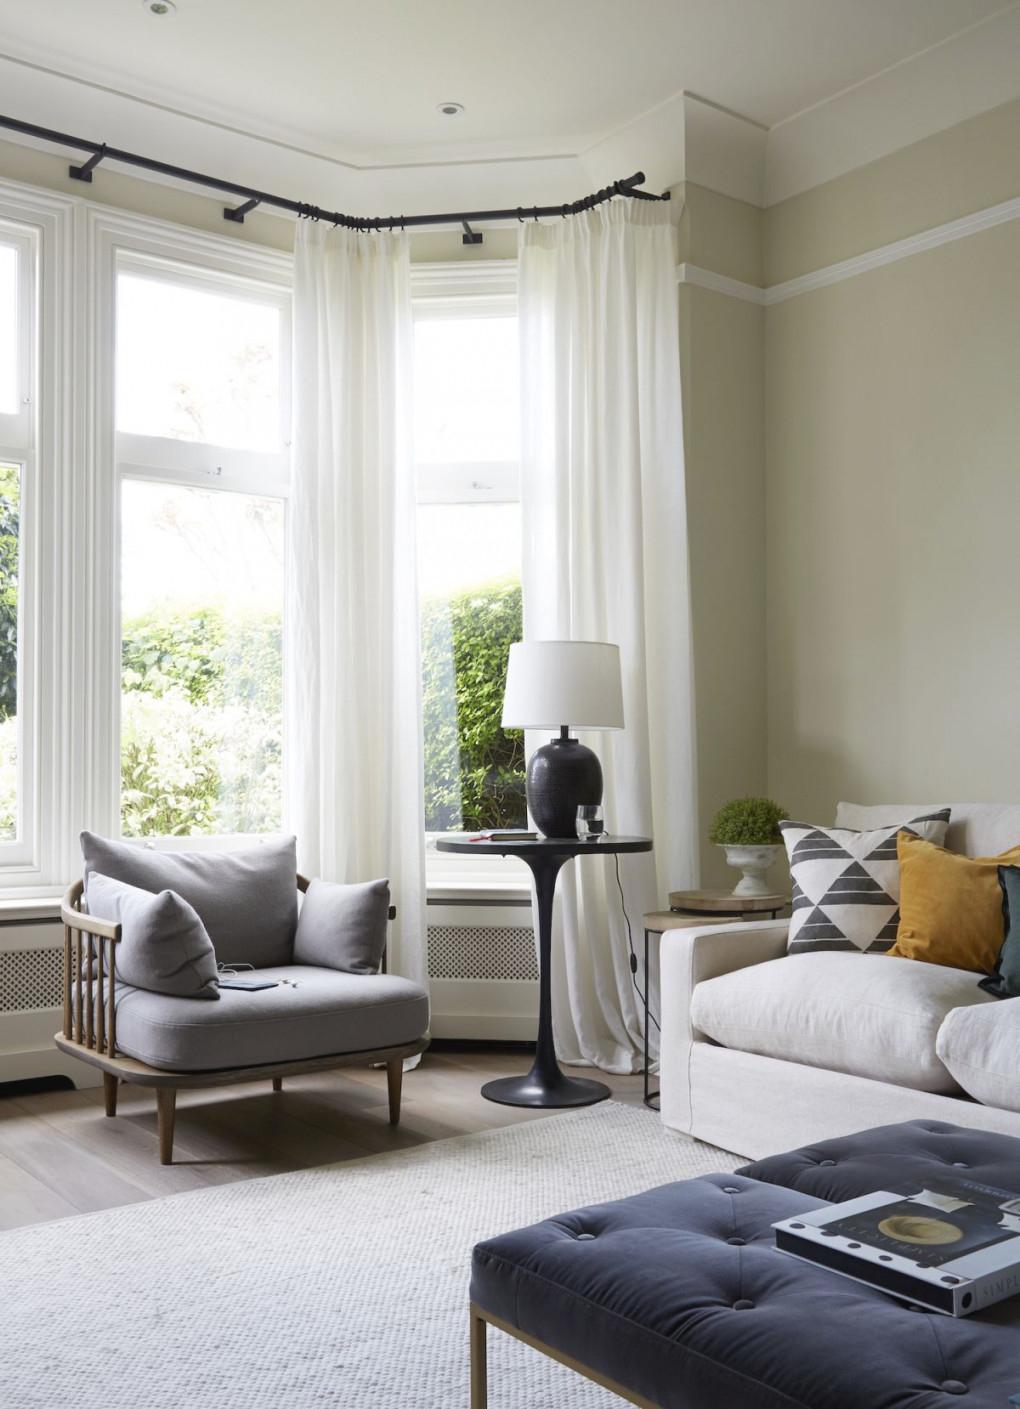 Living Room Curtain Ideas: 20 Stylish Curtain Styles For within Ideas Gallery For Curtain Styles For Living Rooms